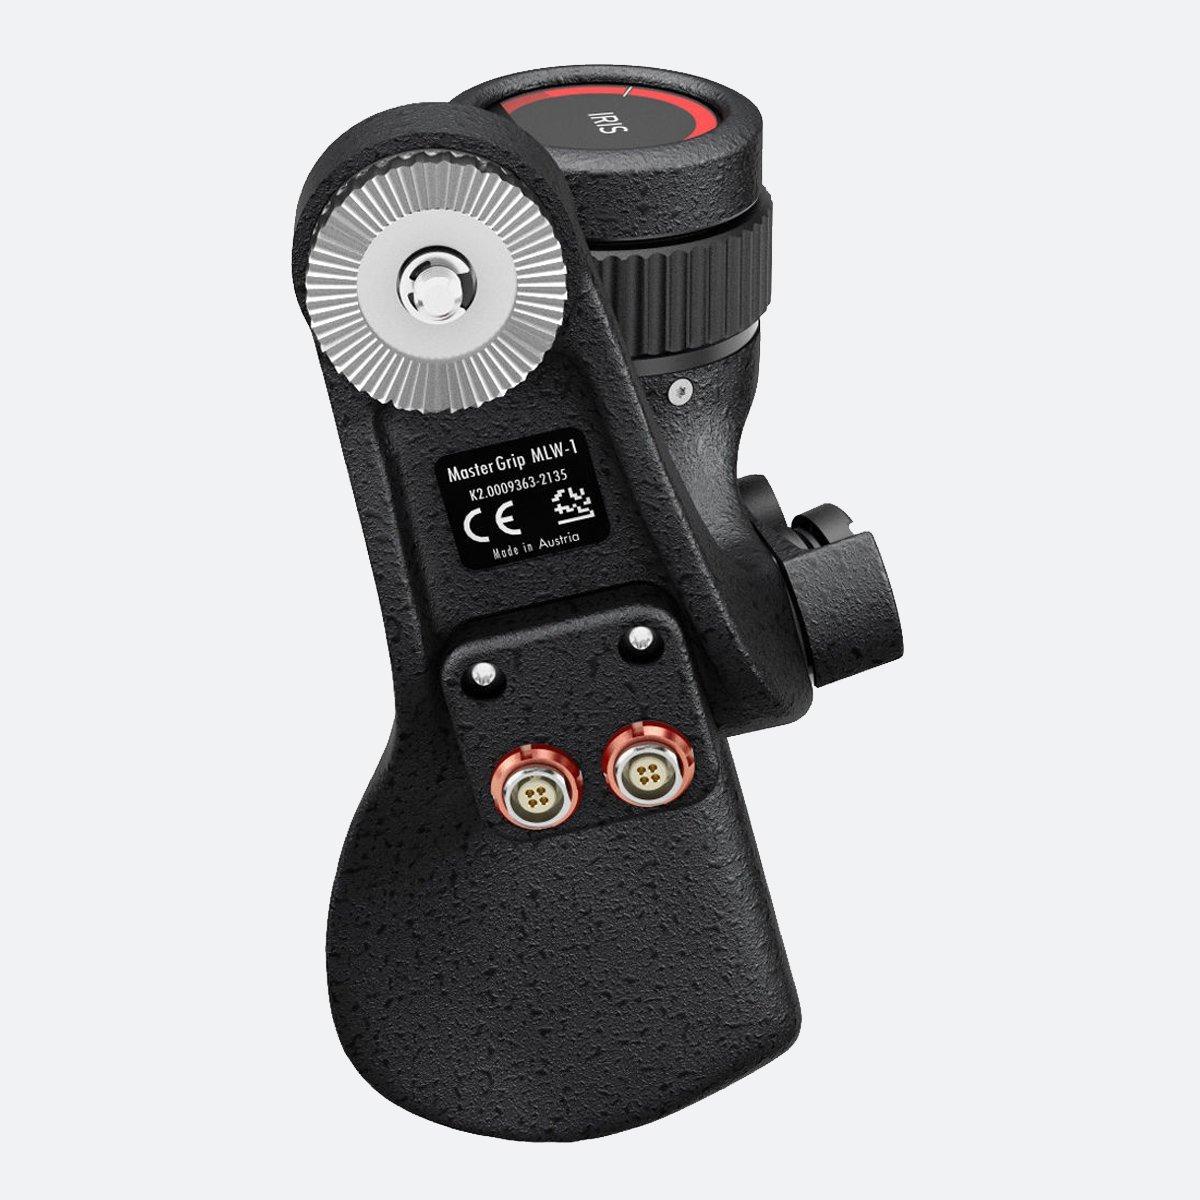 ARRI Master Grip Left Wheel MLW-1 Ultimate control